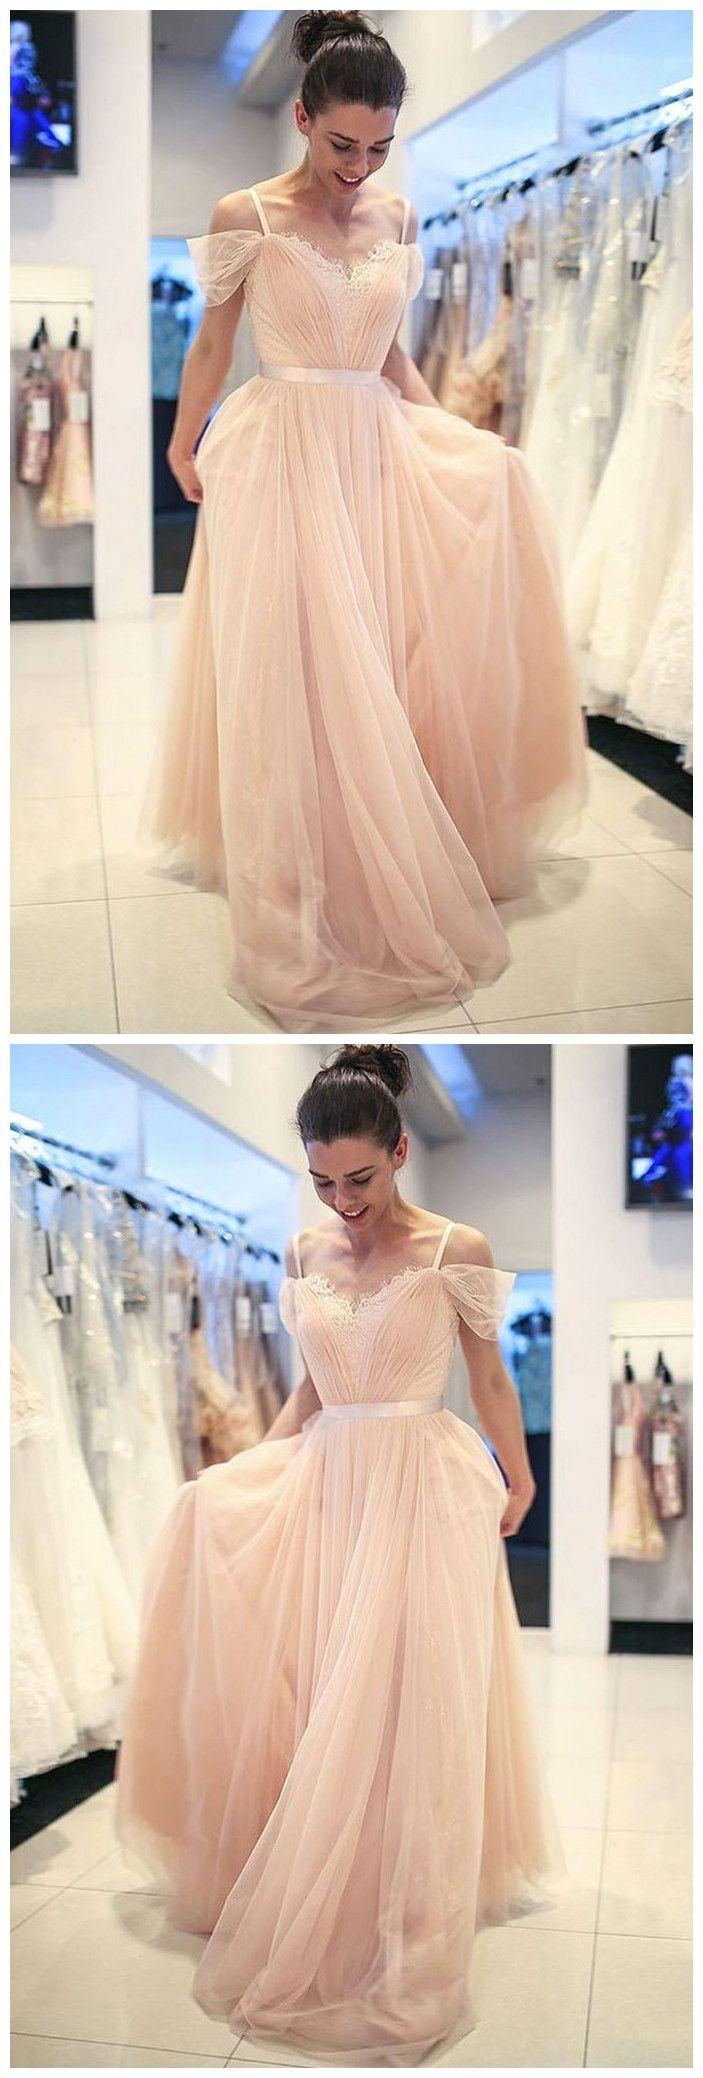 Elegant prom dress aline cheap tulle lace long prom dresses evening